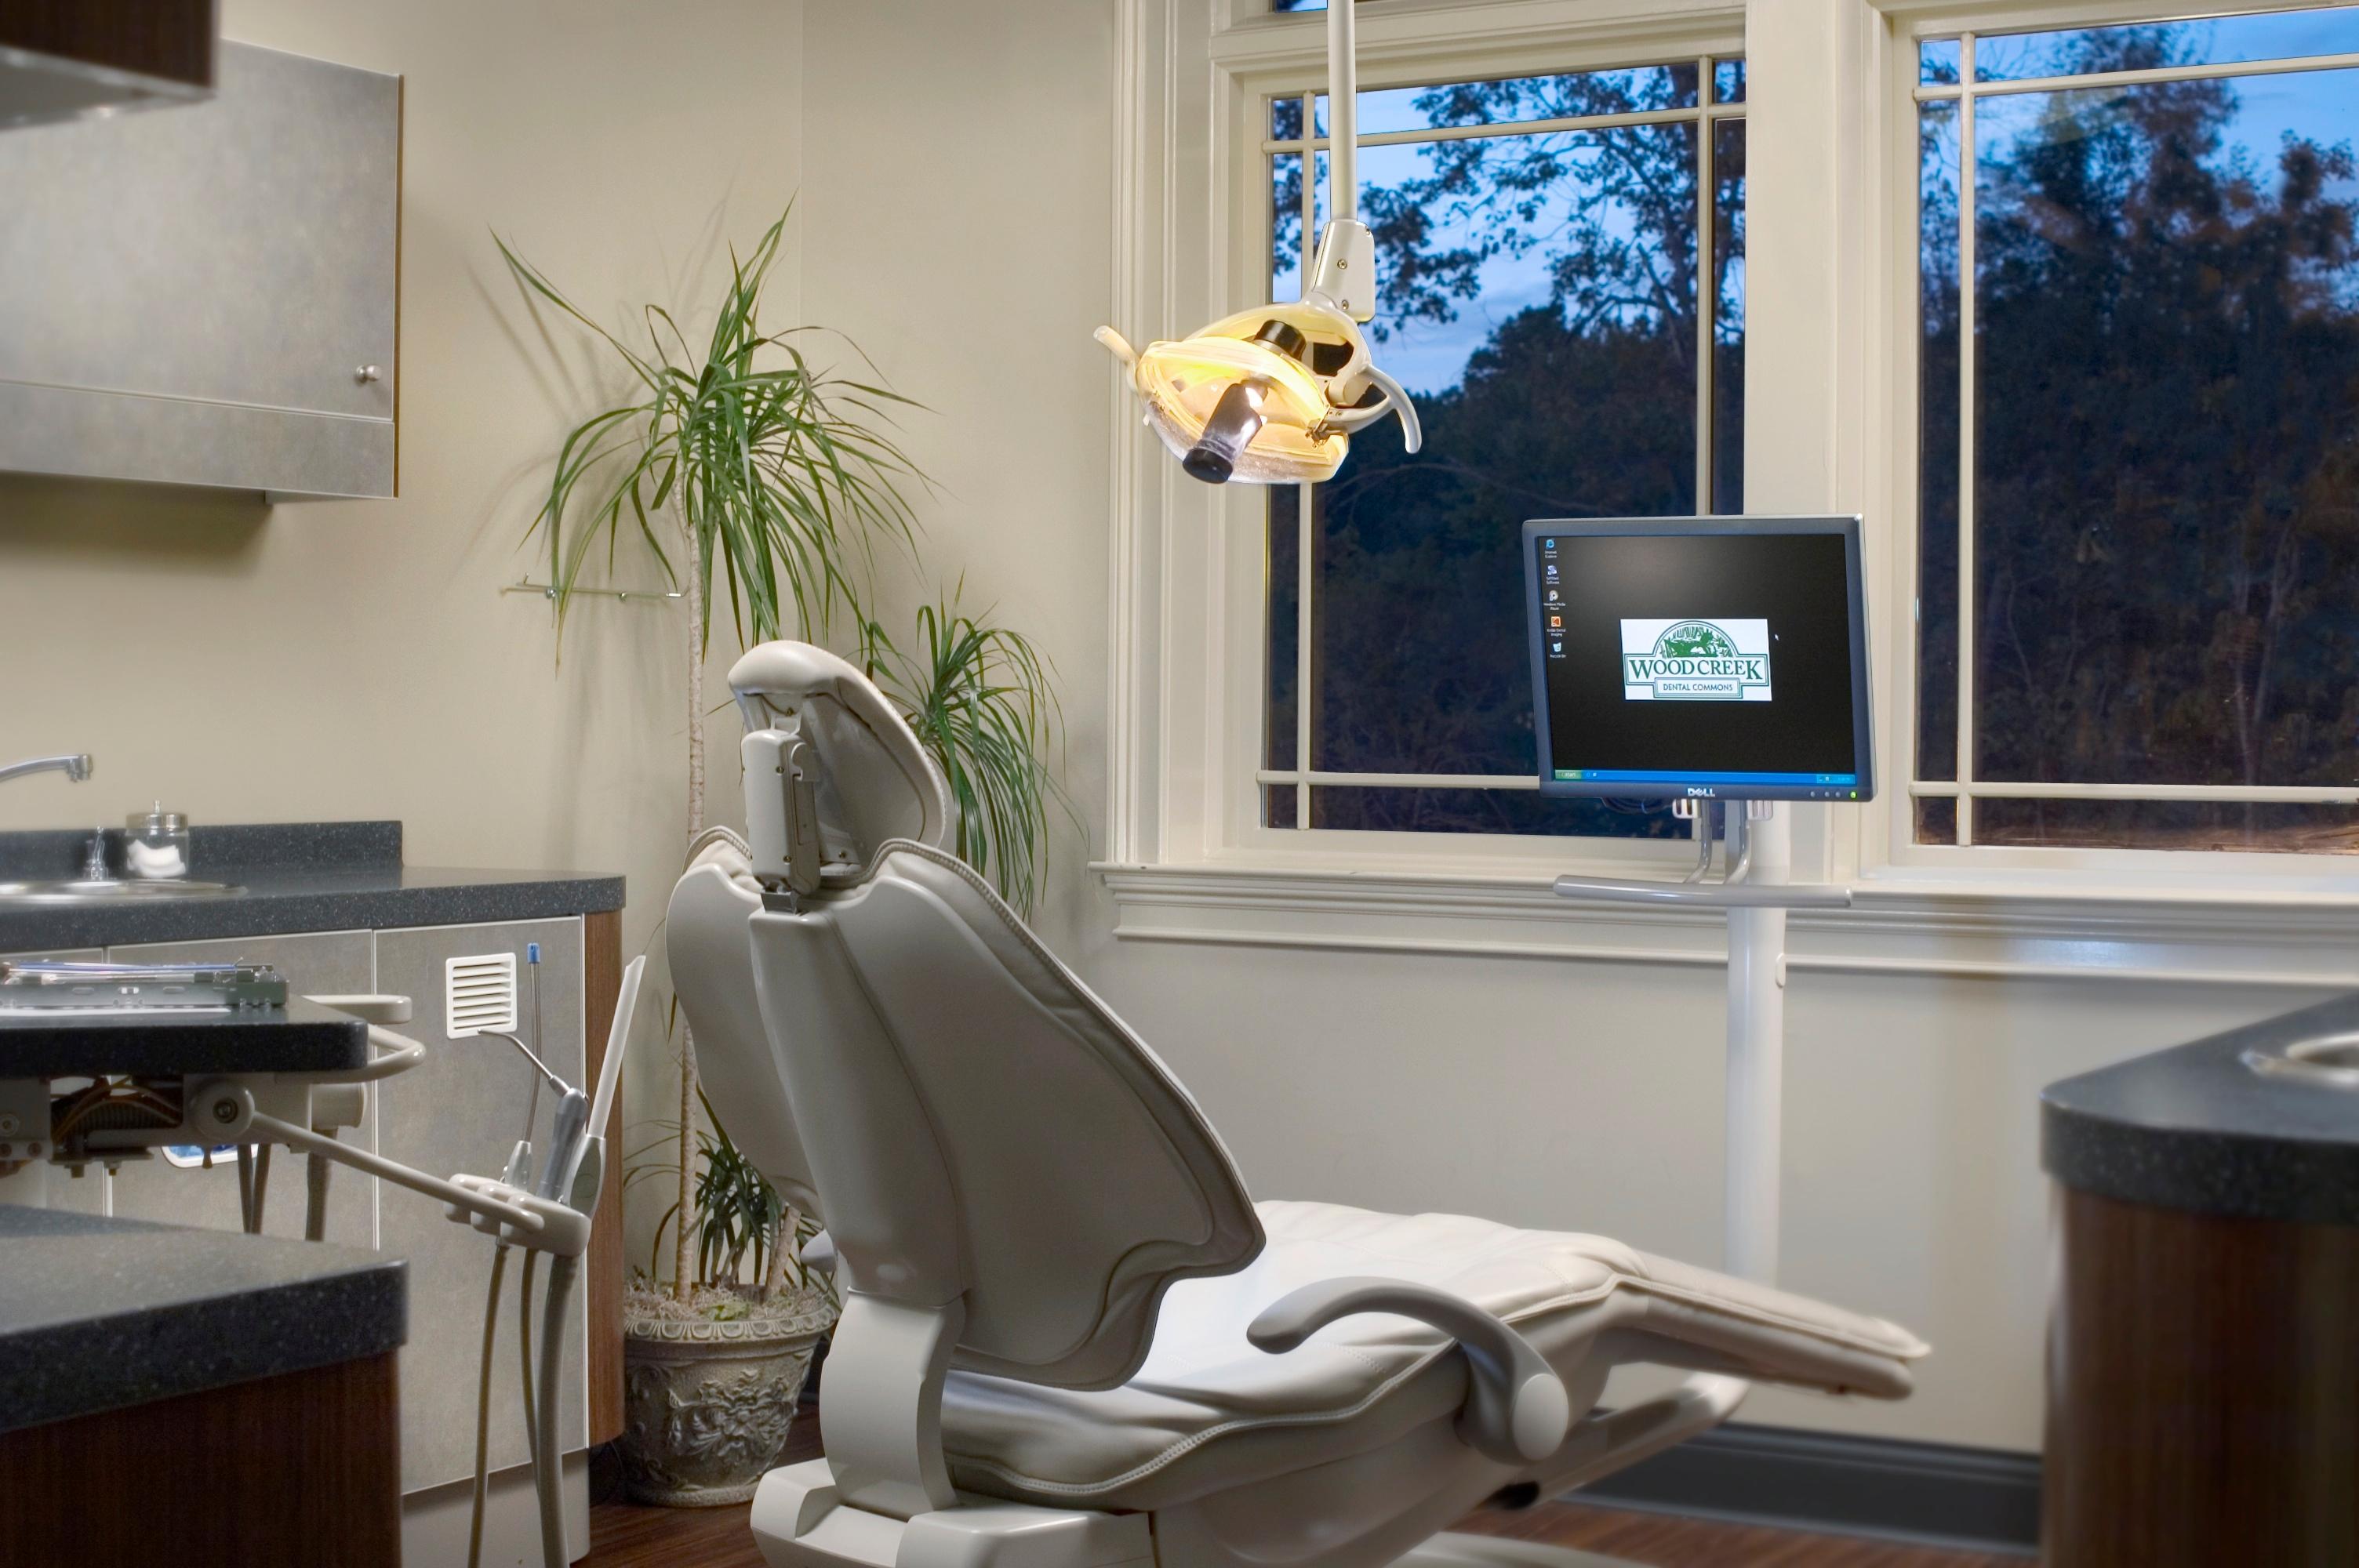 Wood Creek Dental image 3